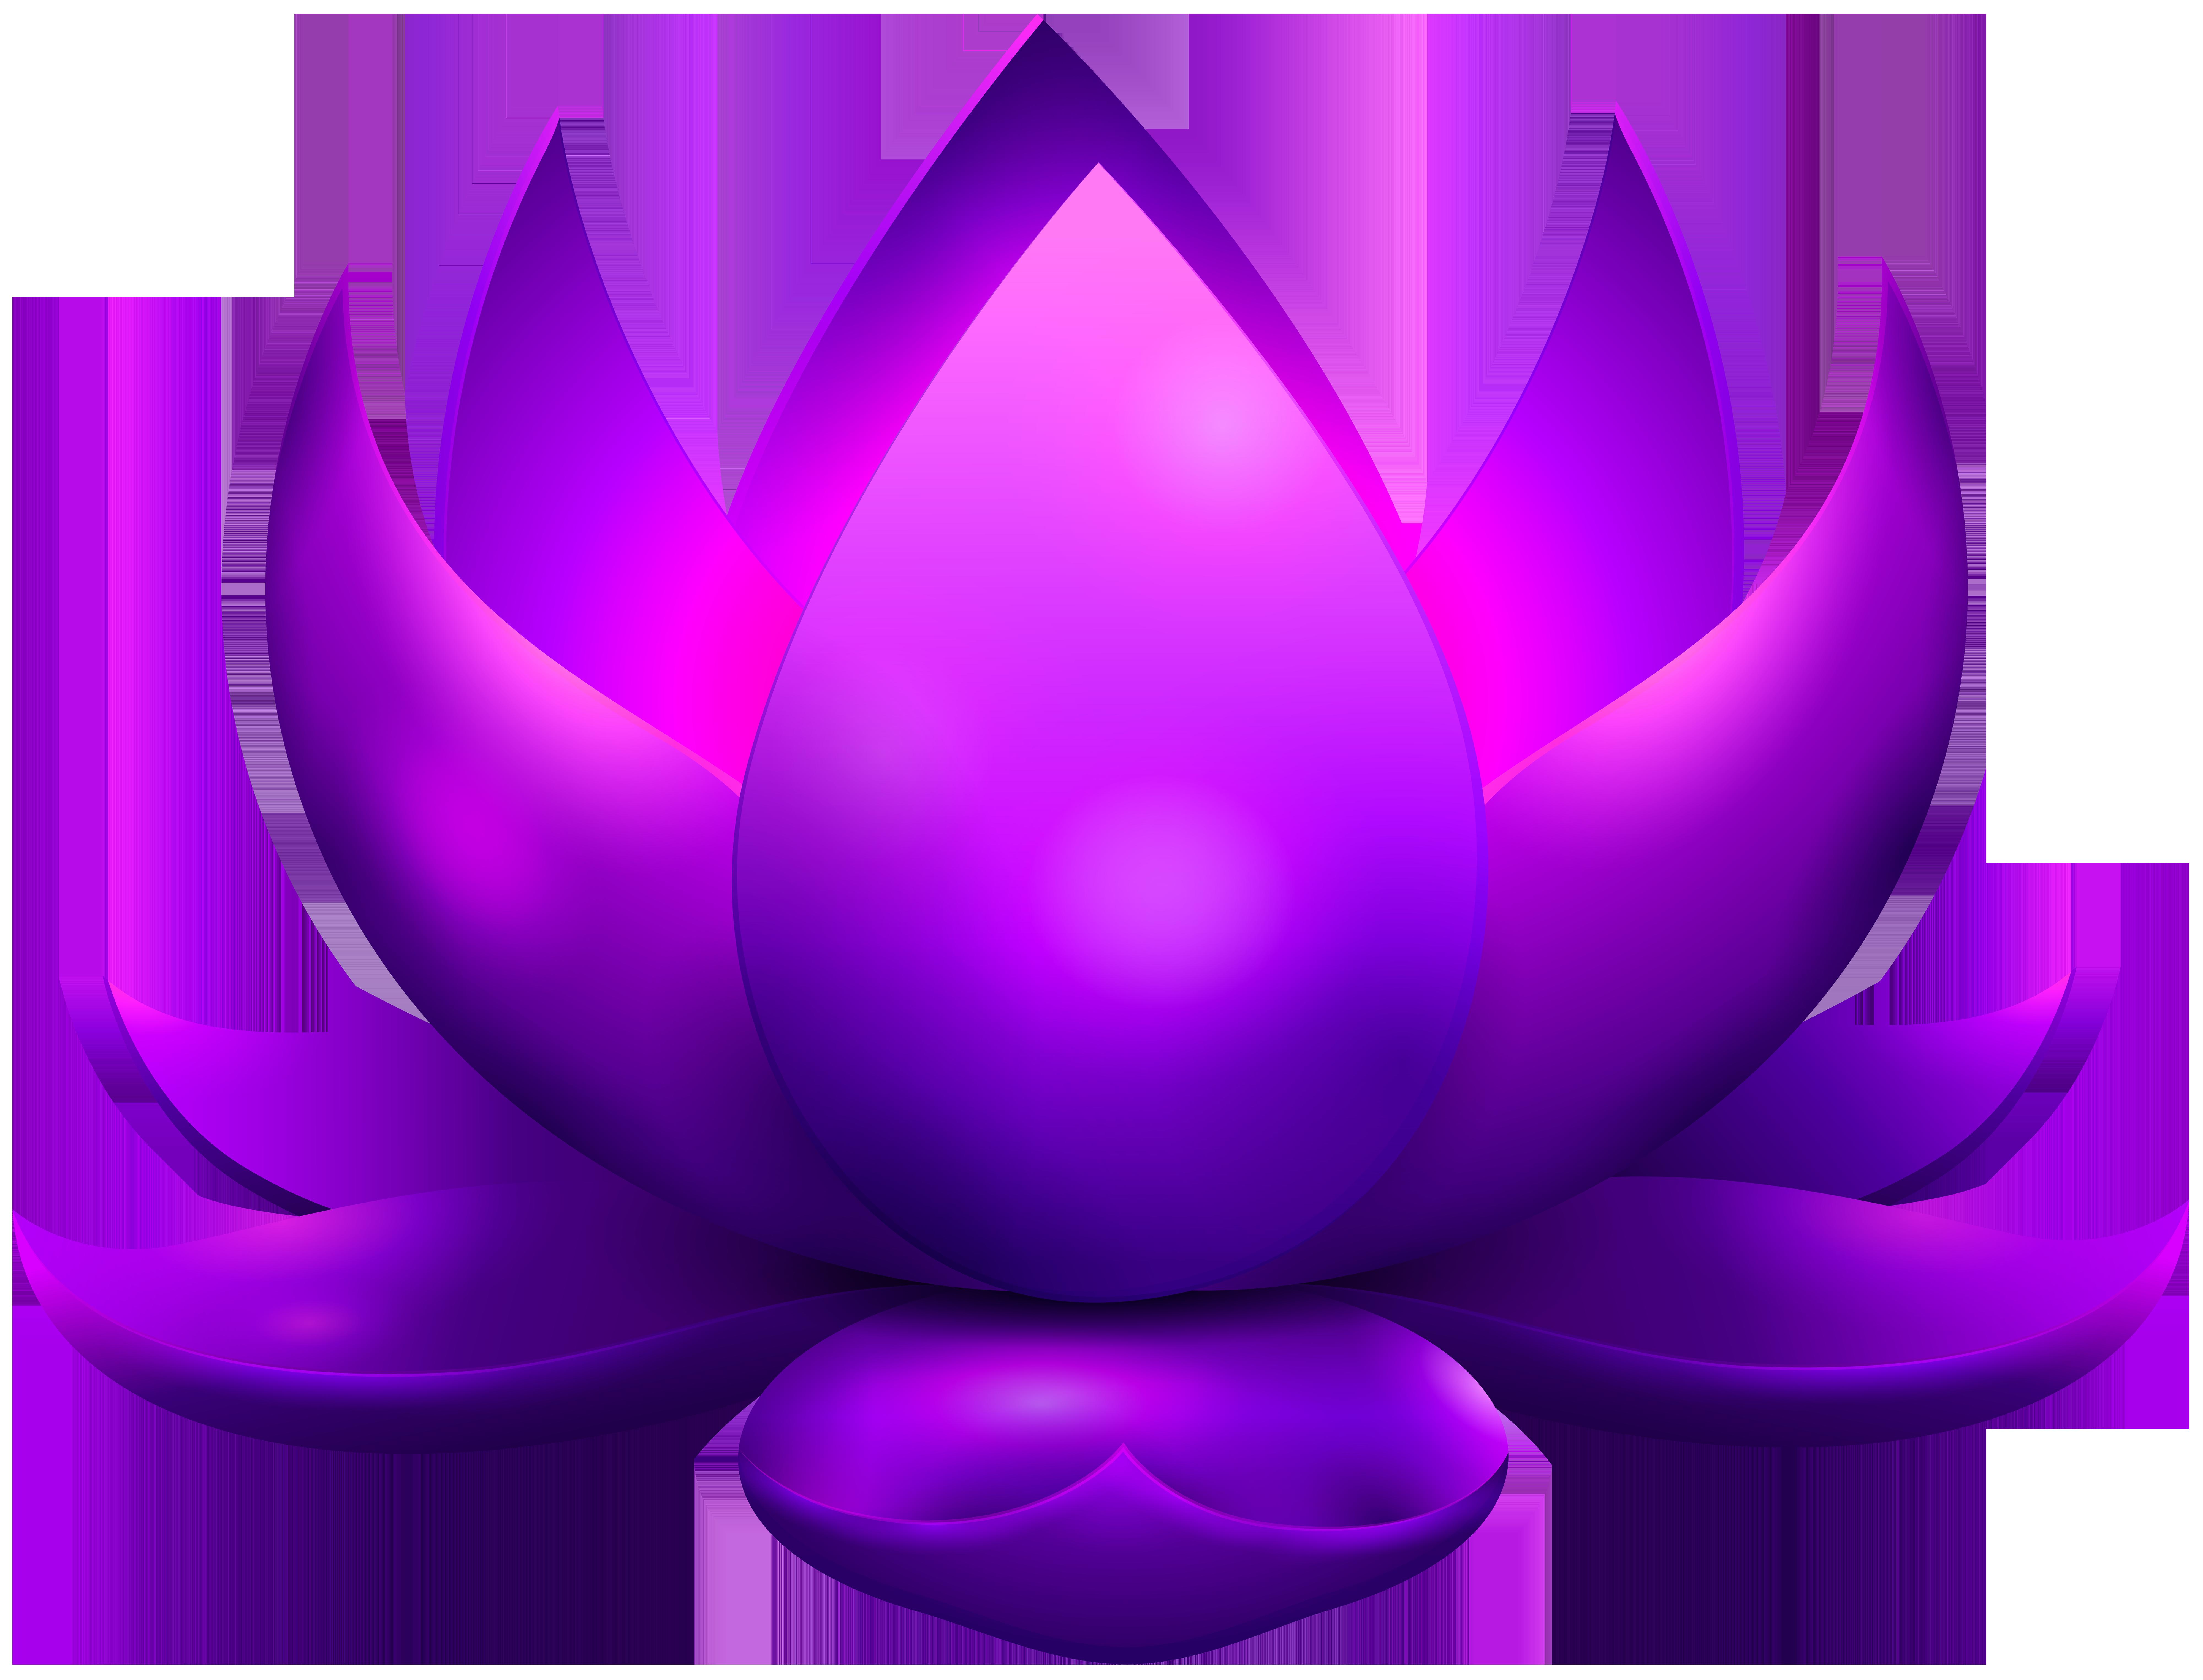 8000x6101 Purple Glowing Lotus Free Png Clip Art Imageu200b Gallery